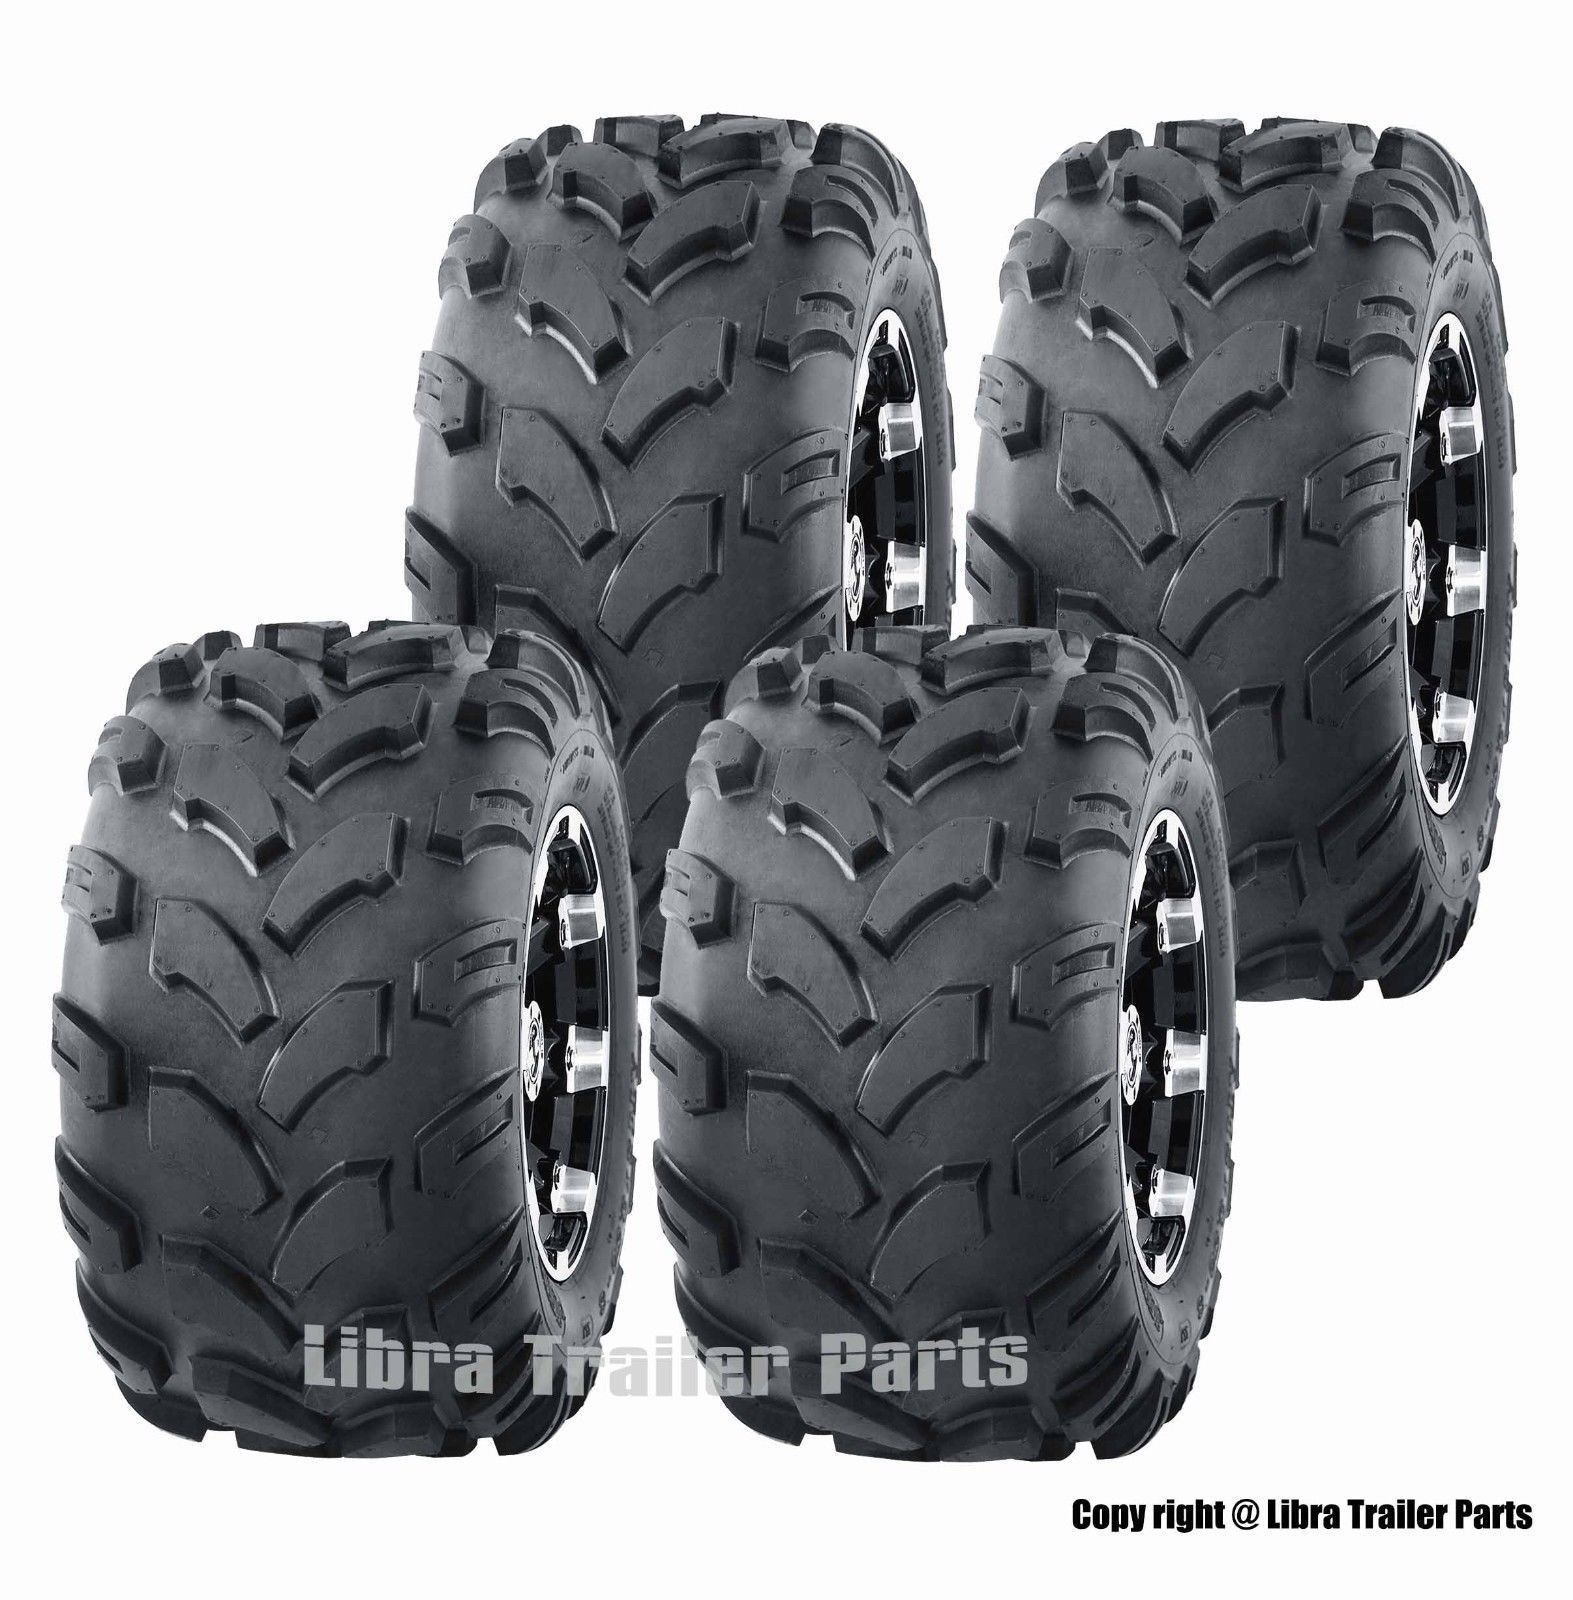 2016-2017 Polaris Outlaw 110 Full Set tires 19x7-8 19x7x8 /& 18x9.5-8 18x9.5x8